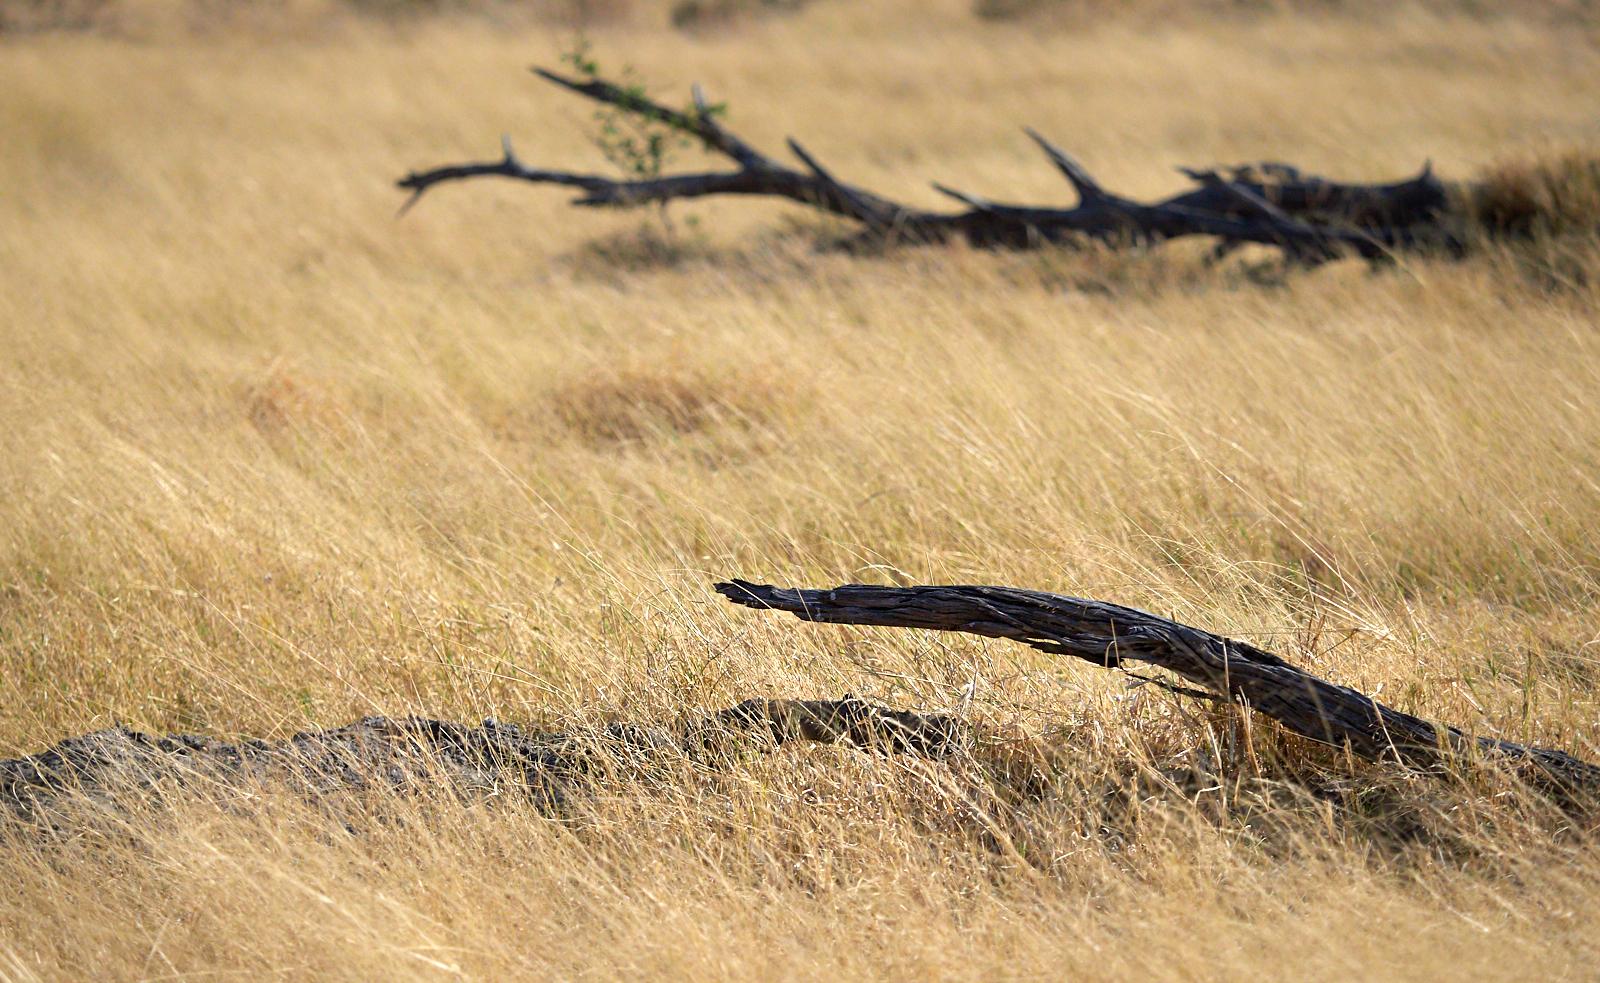 Moremi grasses and logs 1600x1200 sRGB.jpg